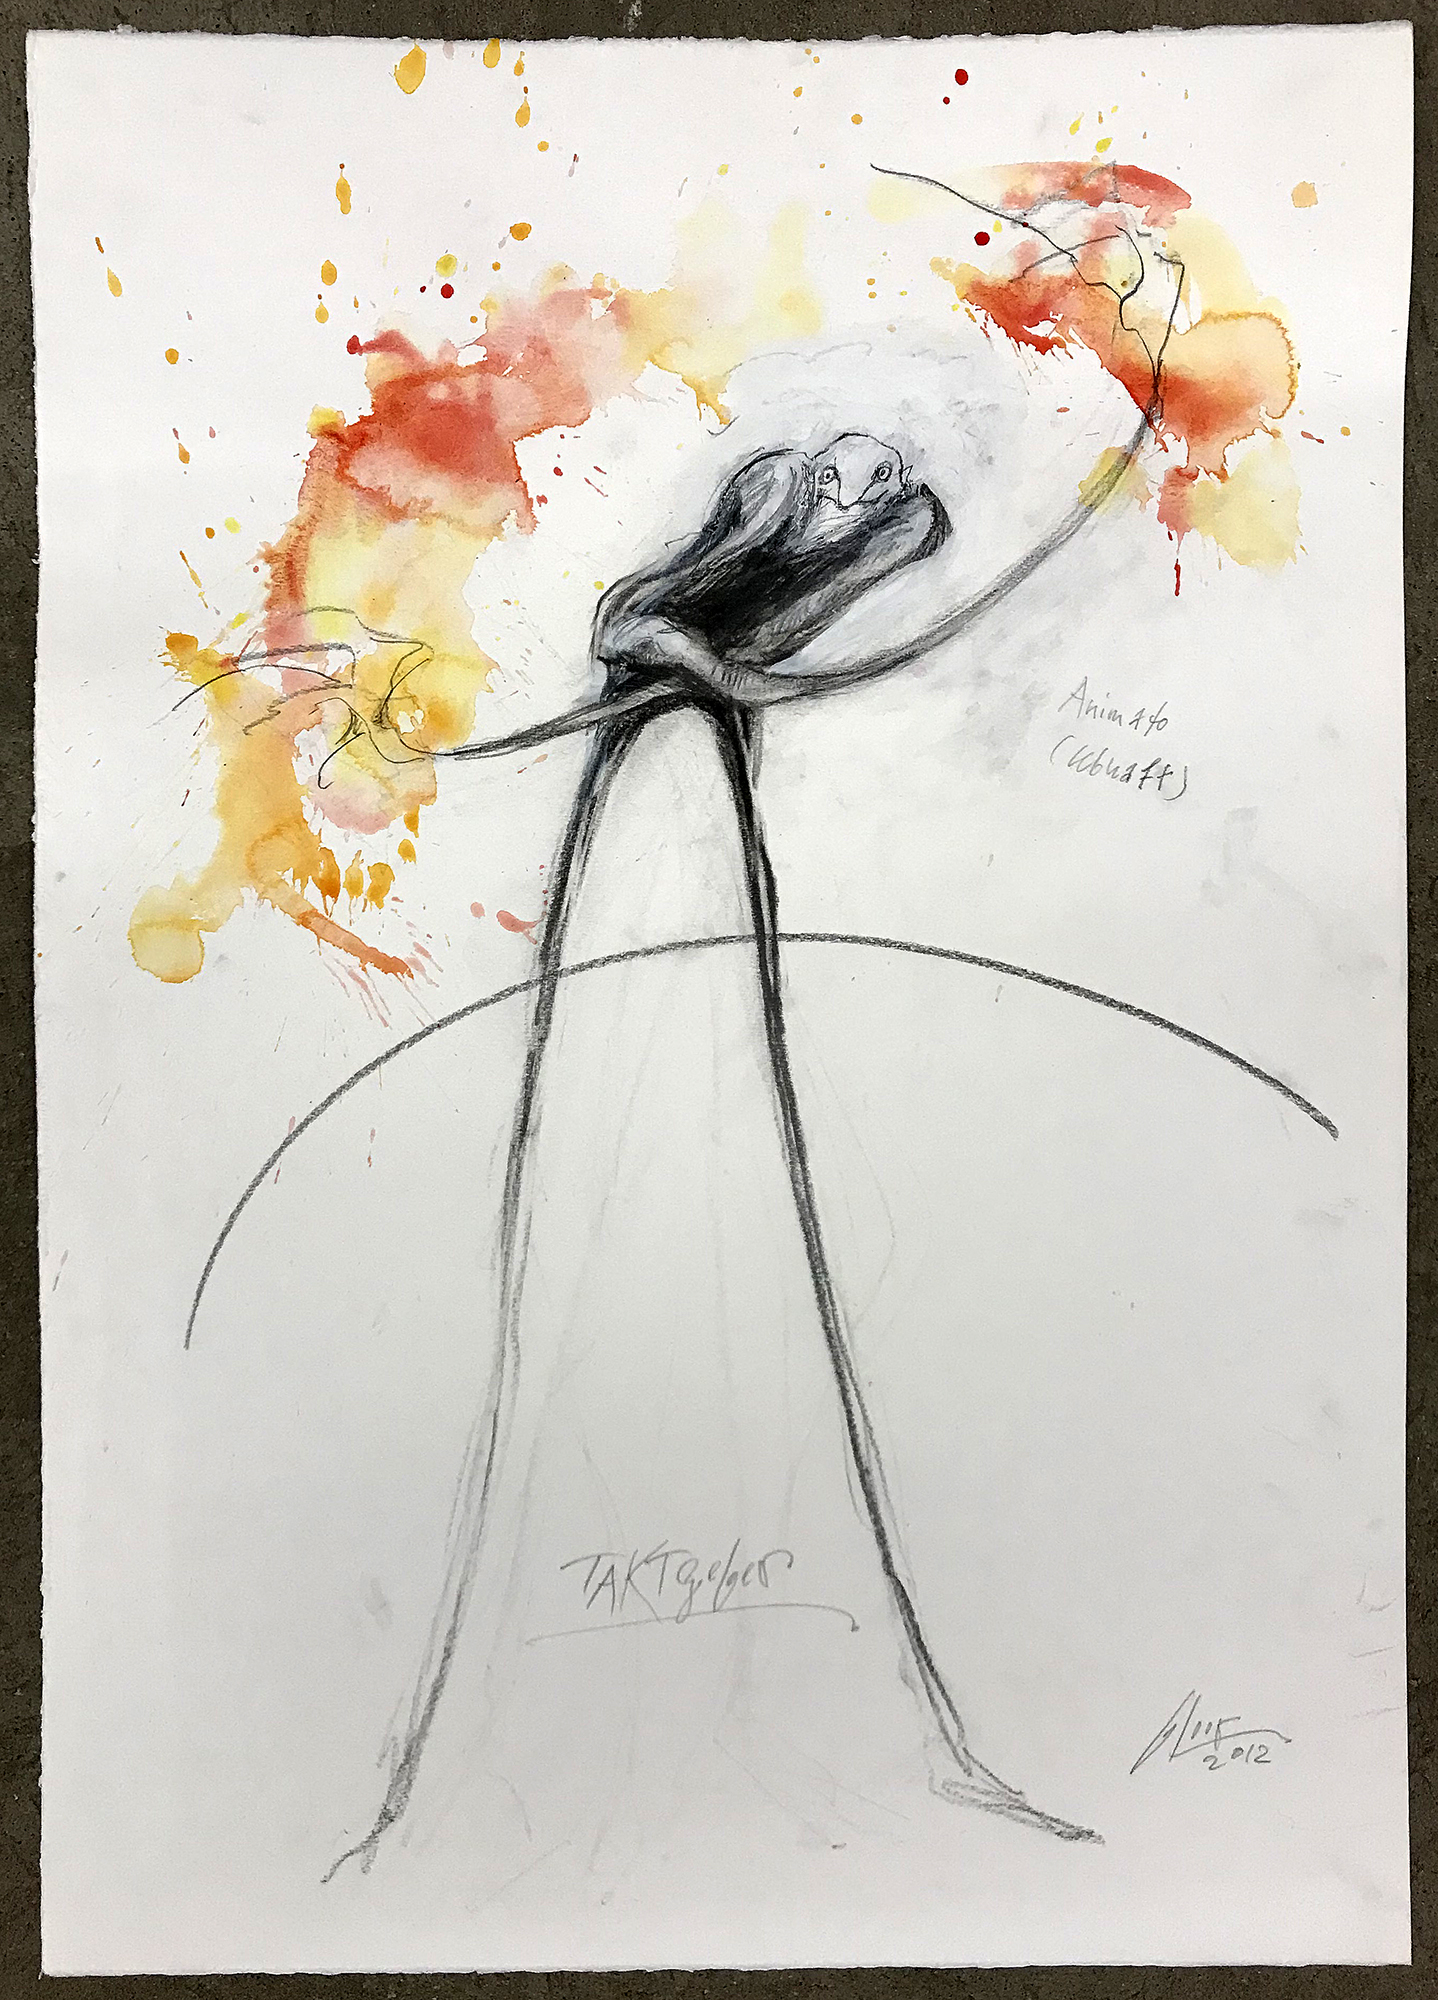 Taktgeber / Animato, 2012, Mischtechnik auf Büttenpapier, ca. 40 x 60, ohne Rahmen